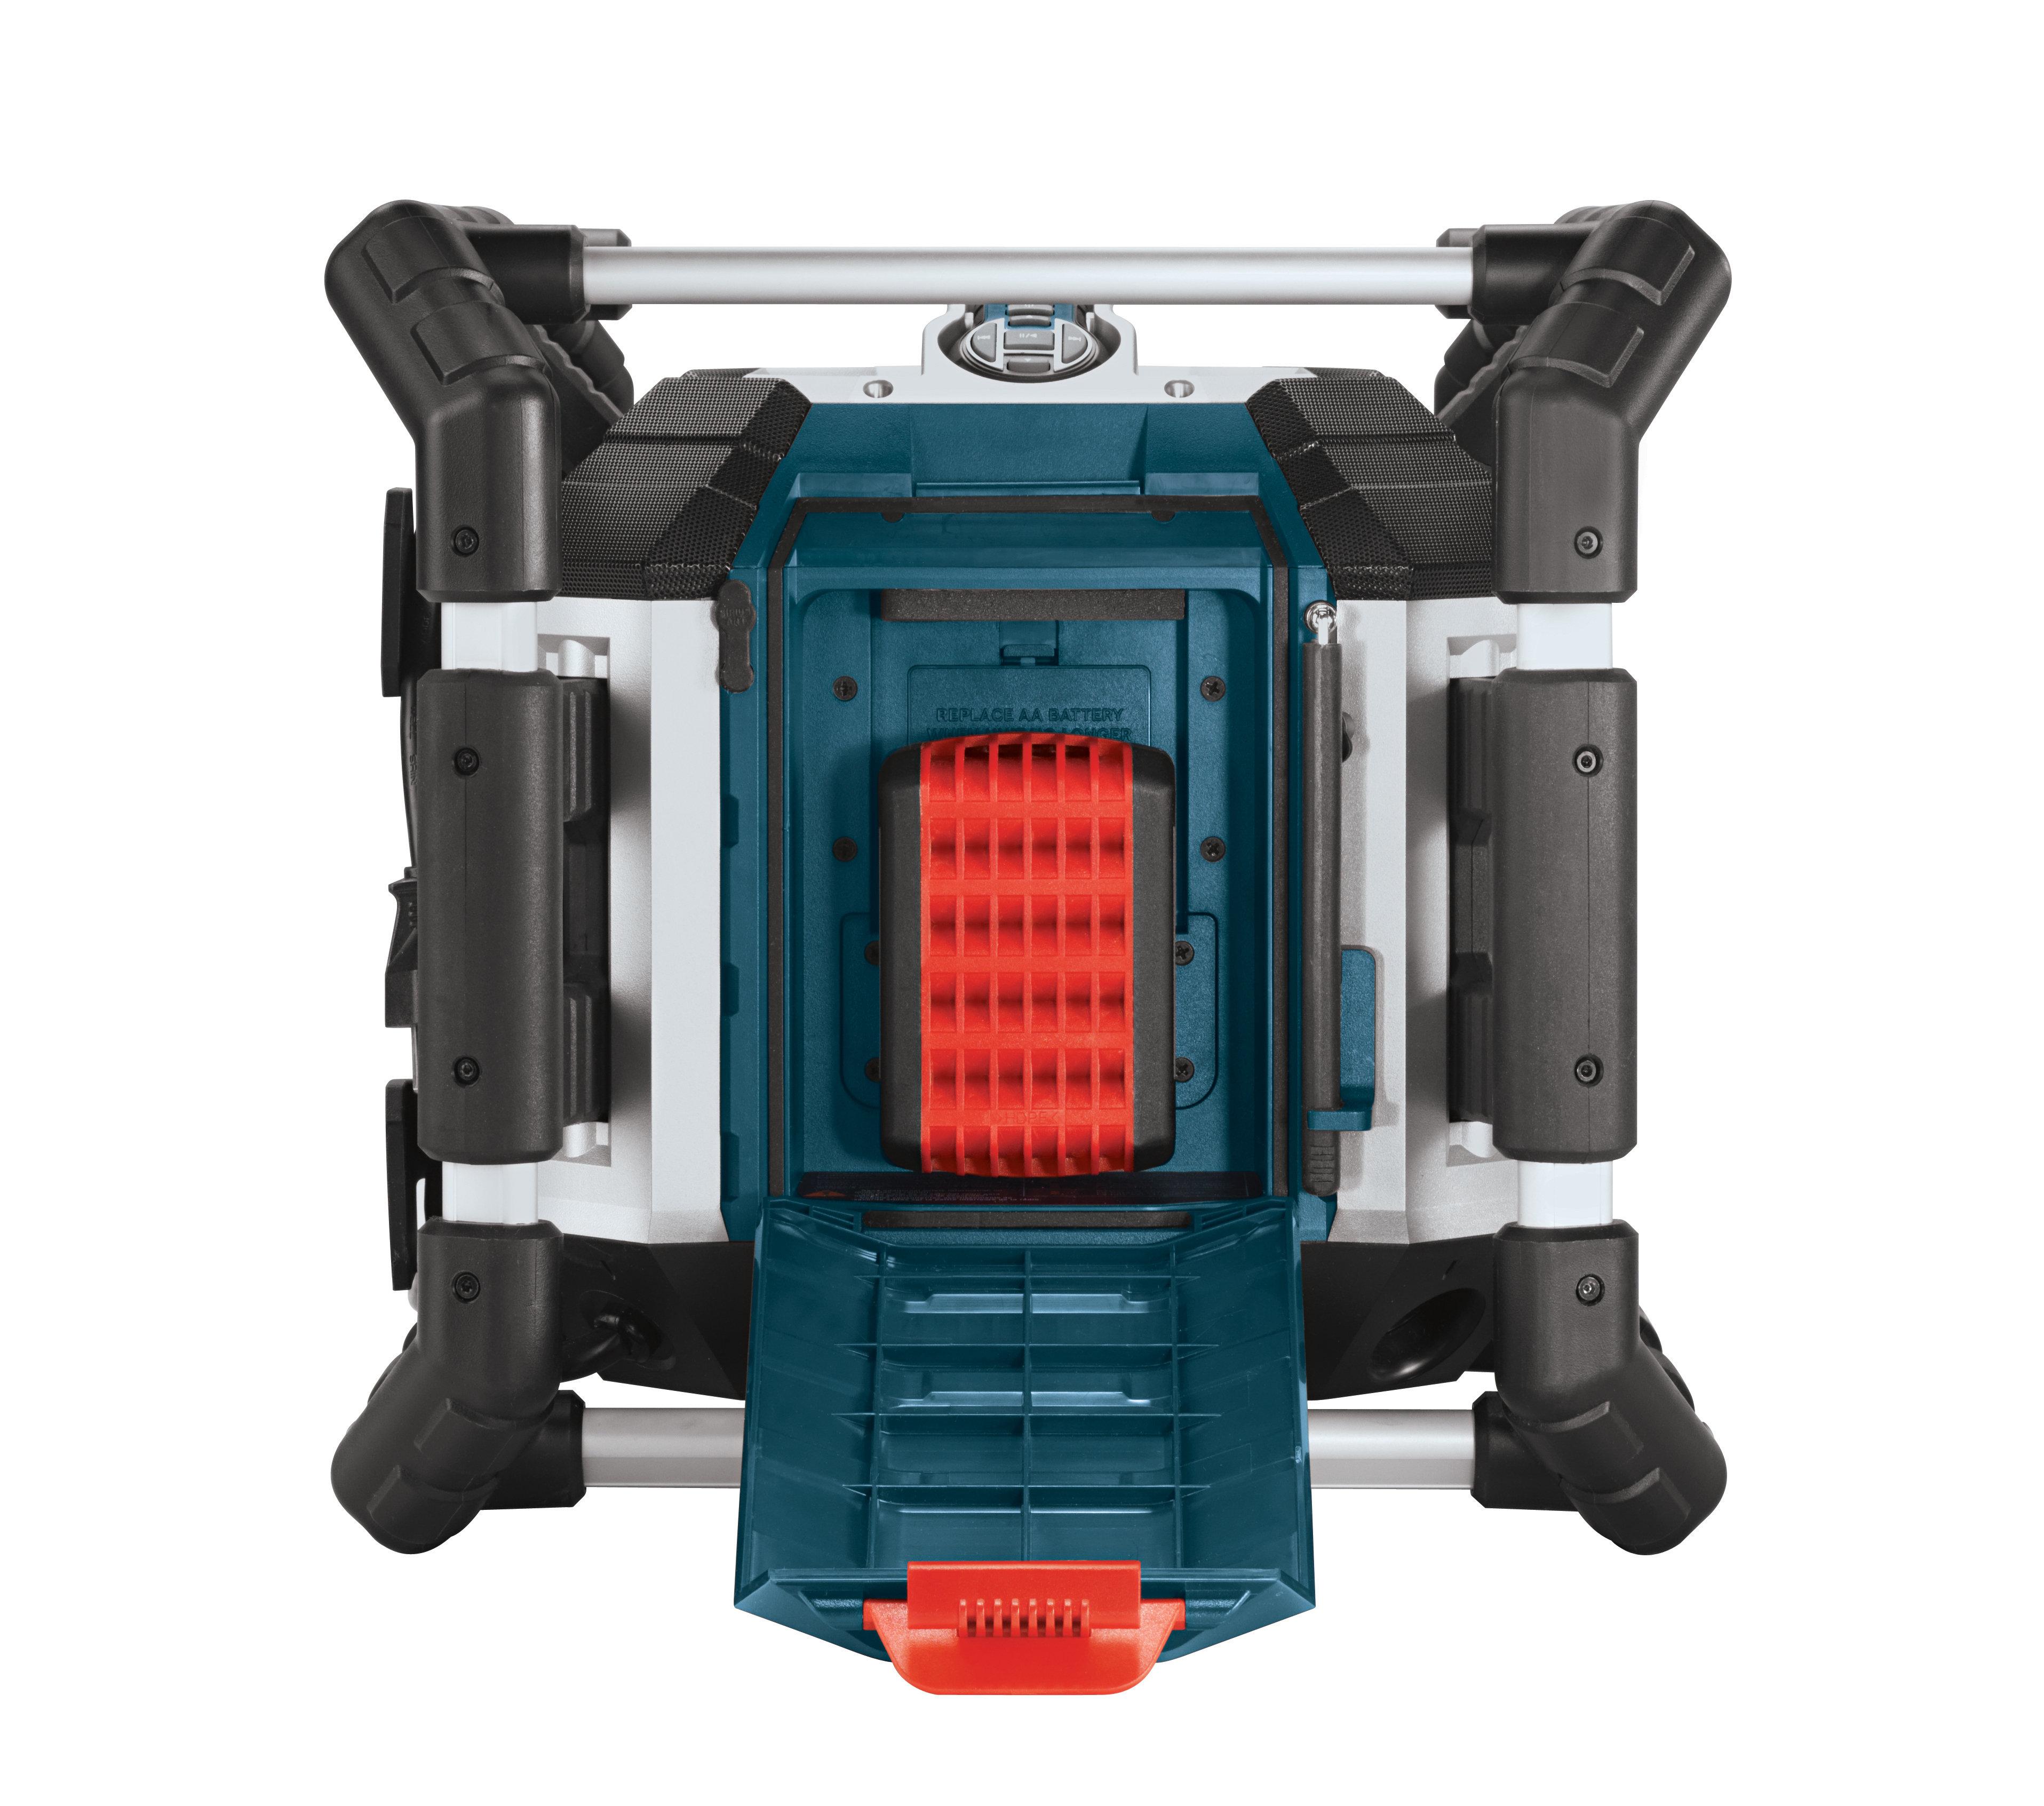 https://thetechjournal.com/wp-content/uploads/images/1109/1316444015-bosch-pb360d-deluxe-power-box-jobsite-radio-7.jpg